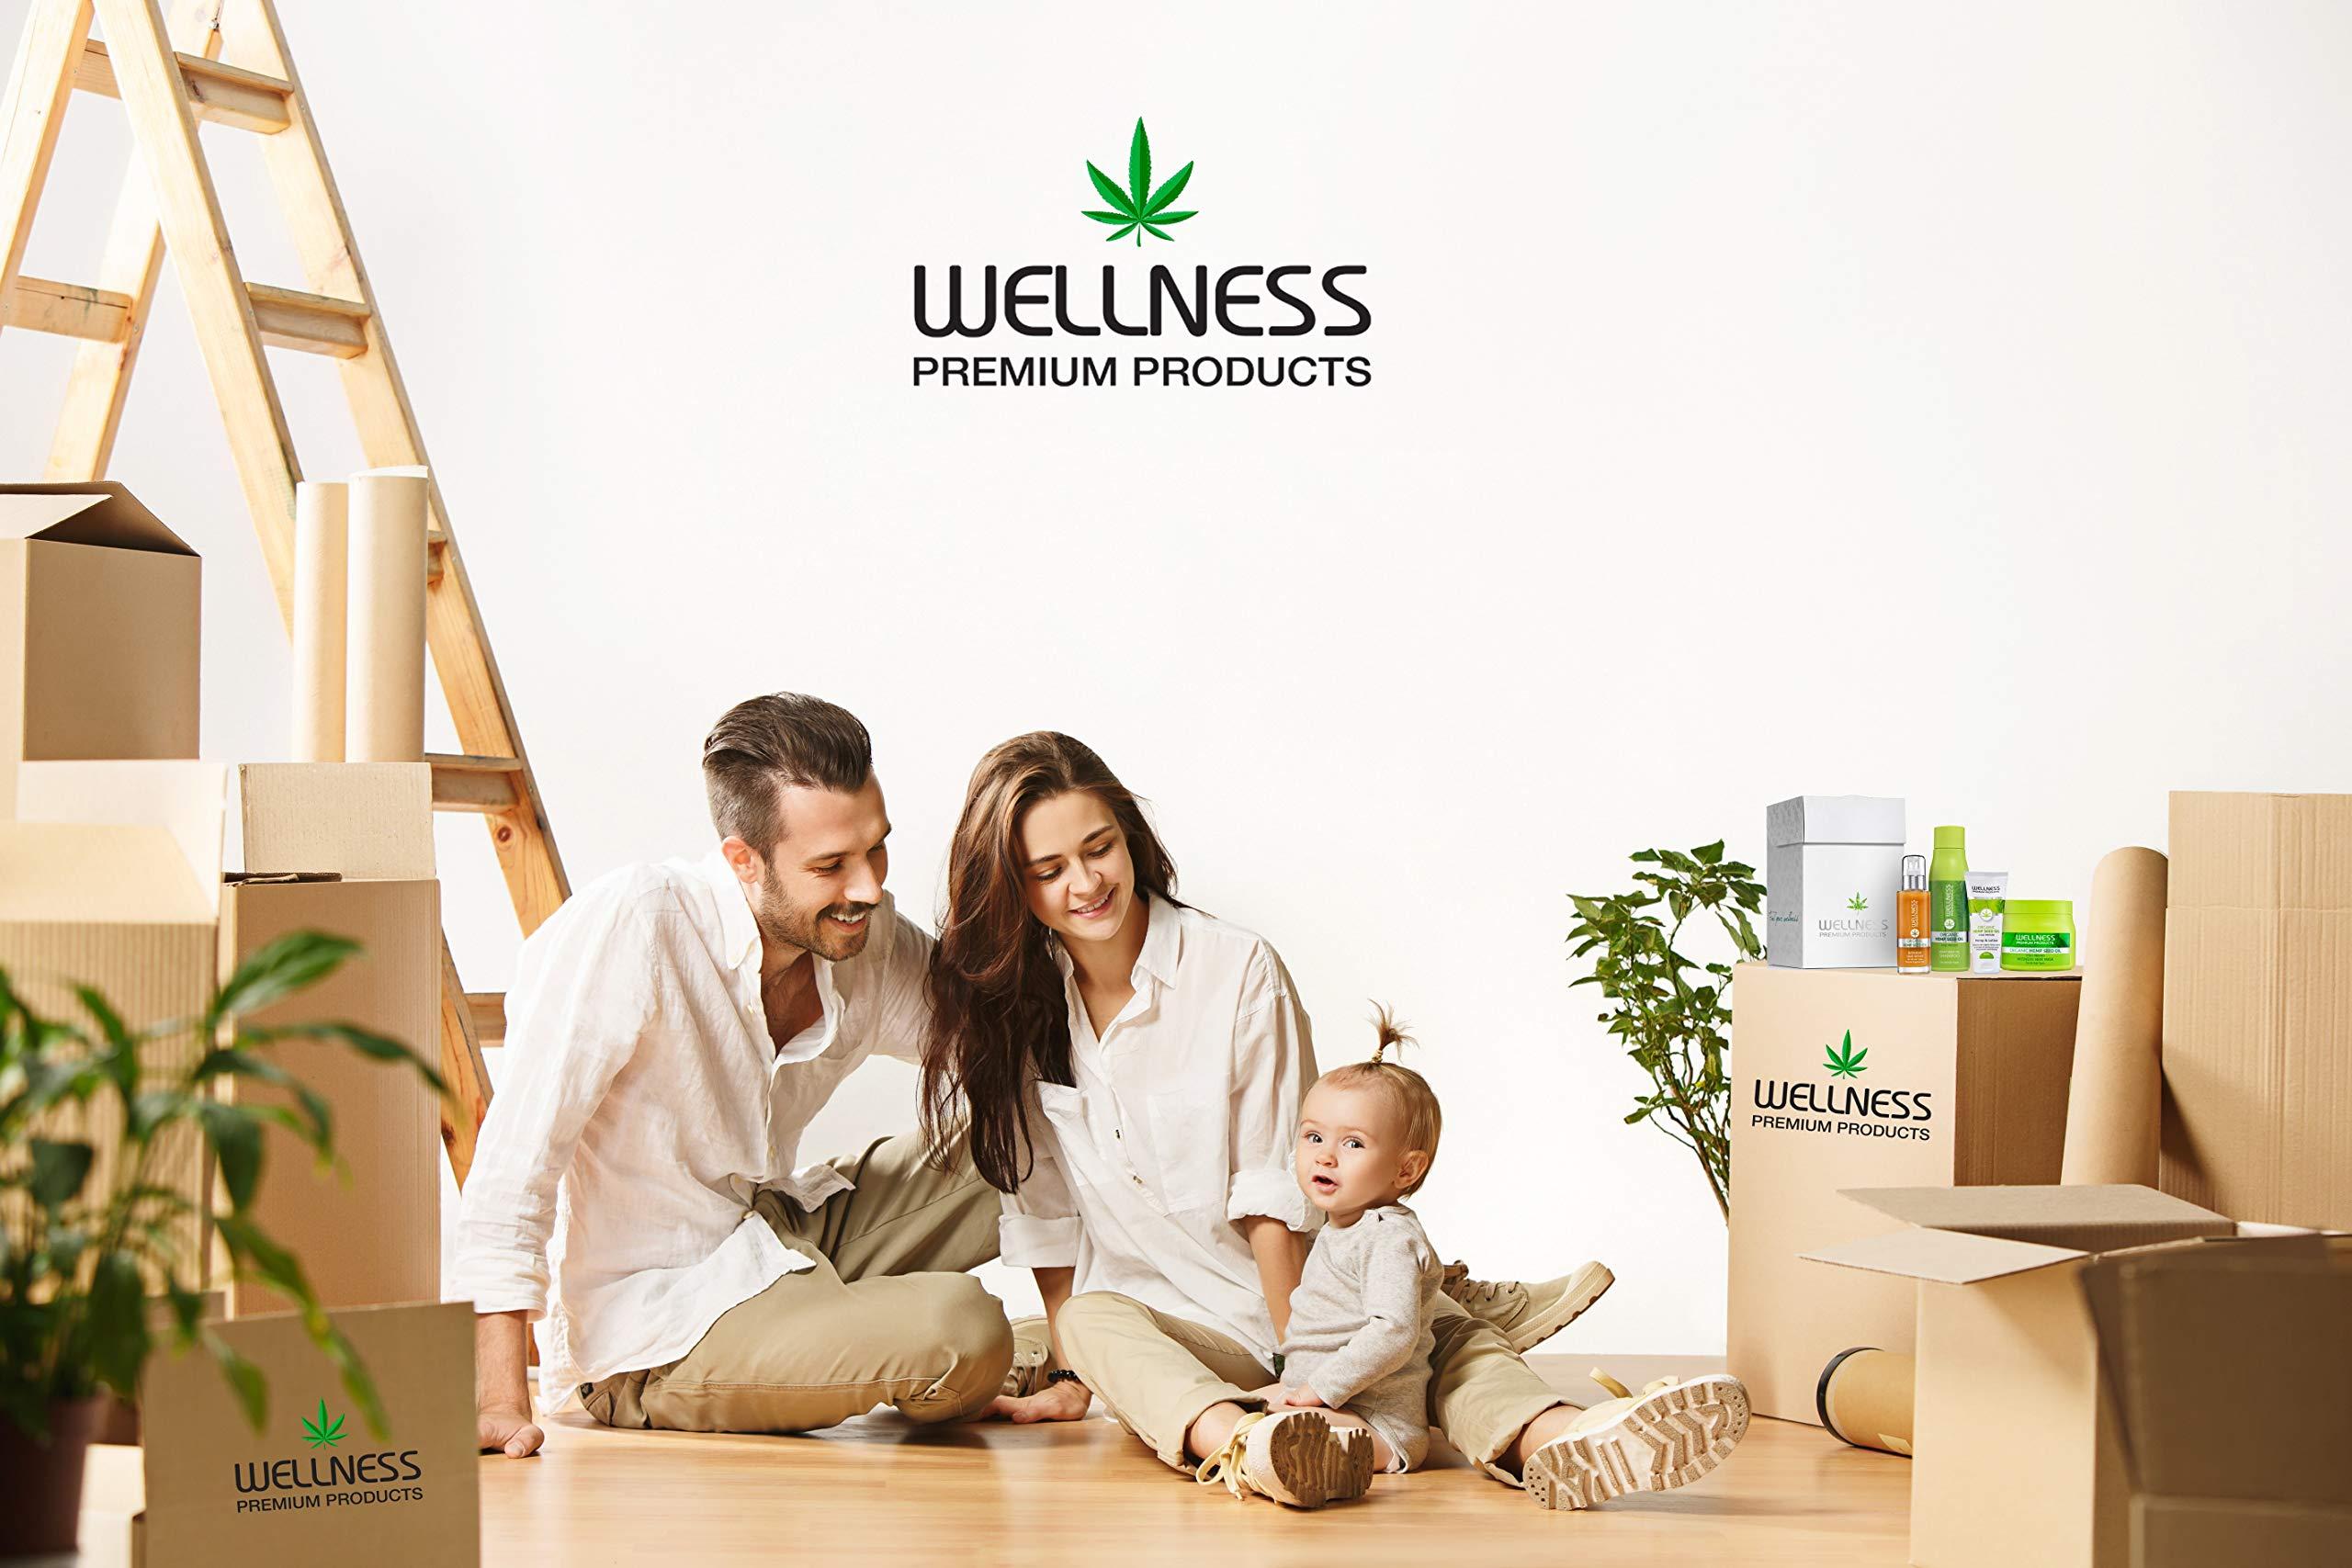 Welllness Premium Products Organic Hemp Serum, 100ML (3.4 oz)